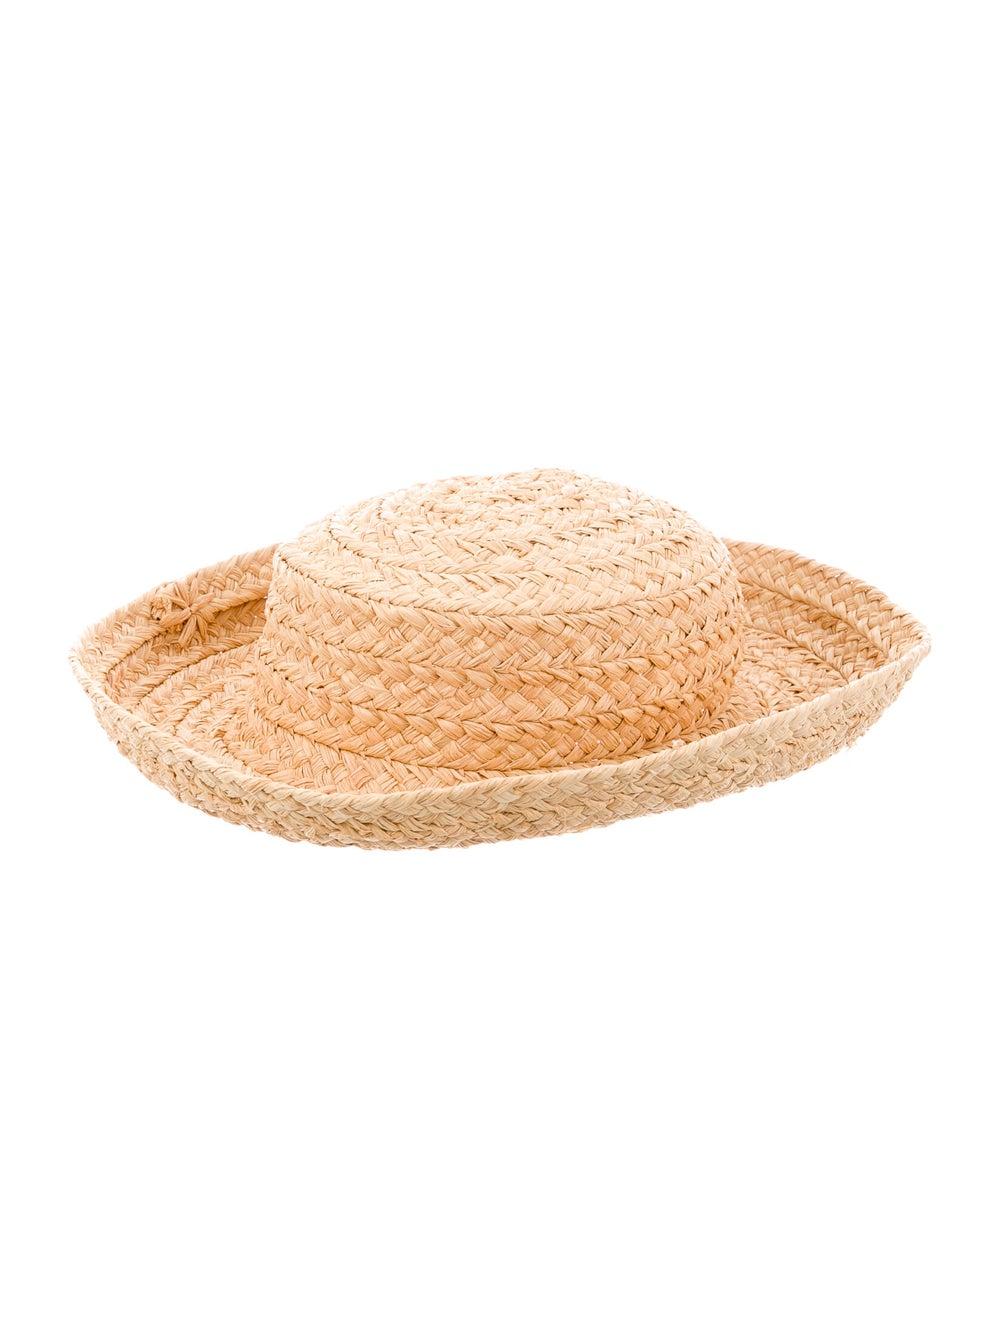 Kaminski Woven Straw Wide-Brim Hat Natural - image 2